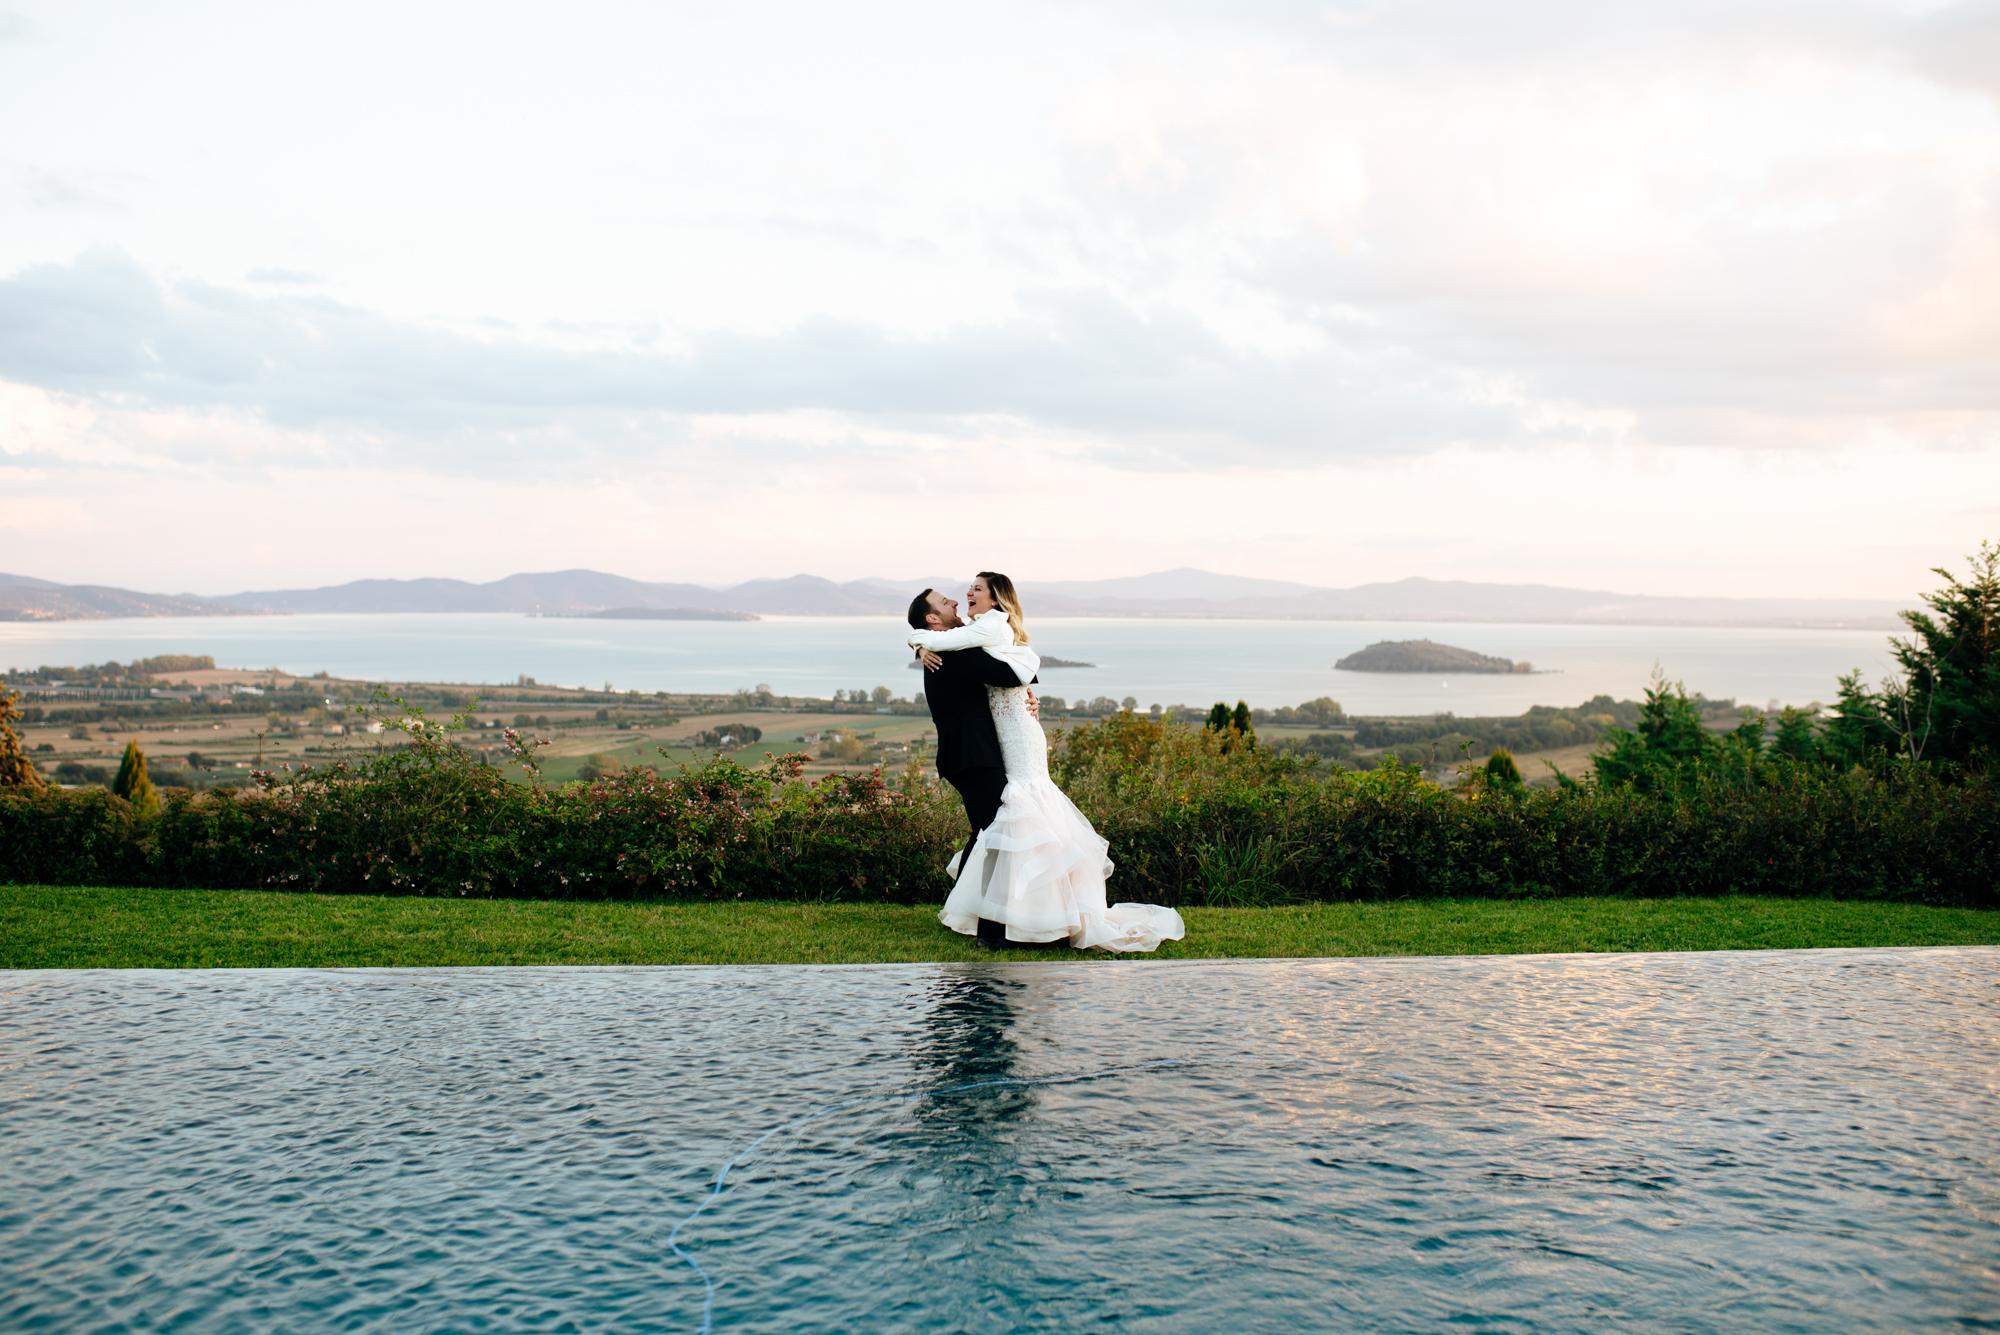 SamErica Studios - Cortona Italy Wedding -  Modern Destination Wedding photographers - modern wedding portraits